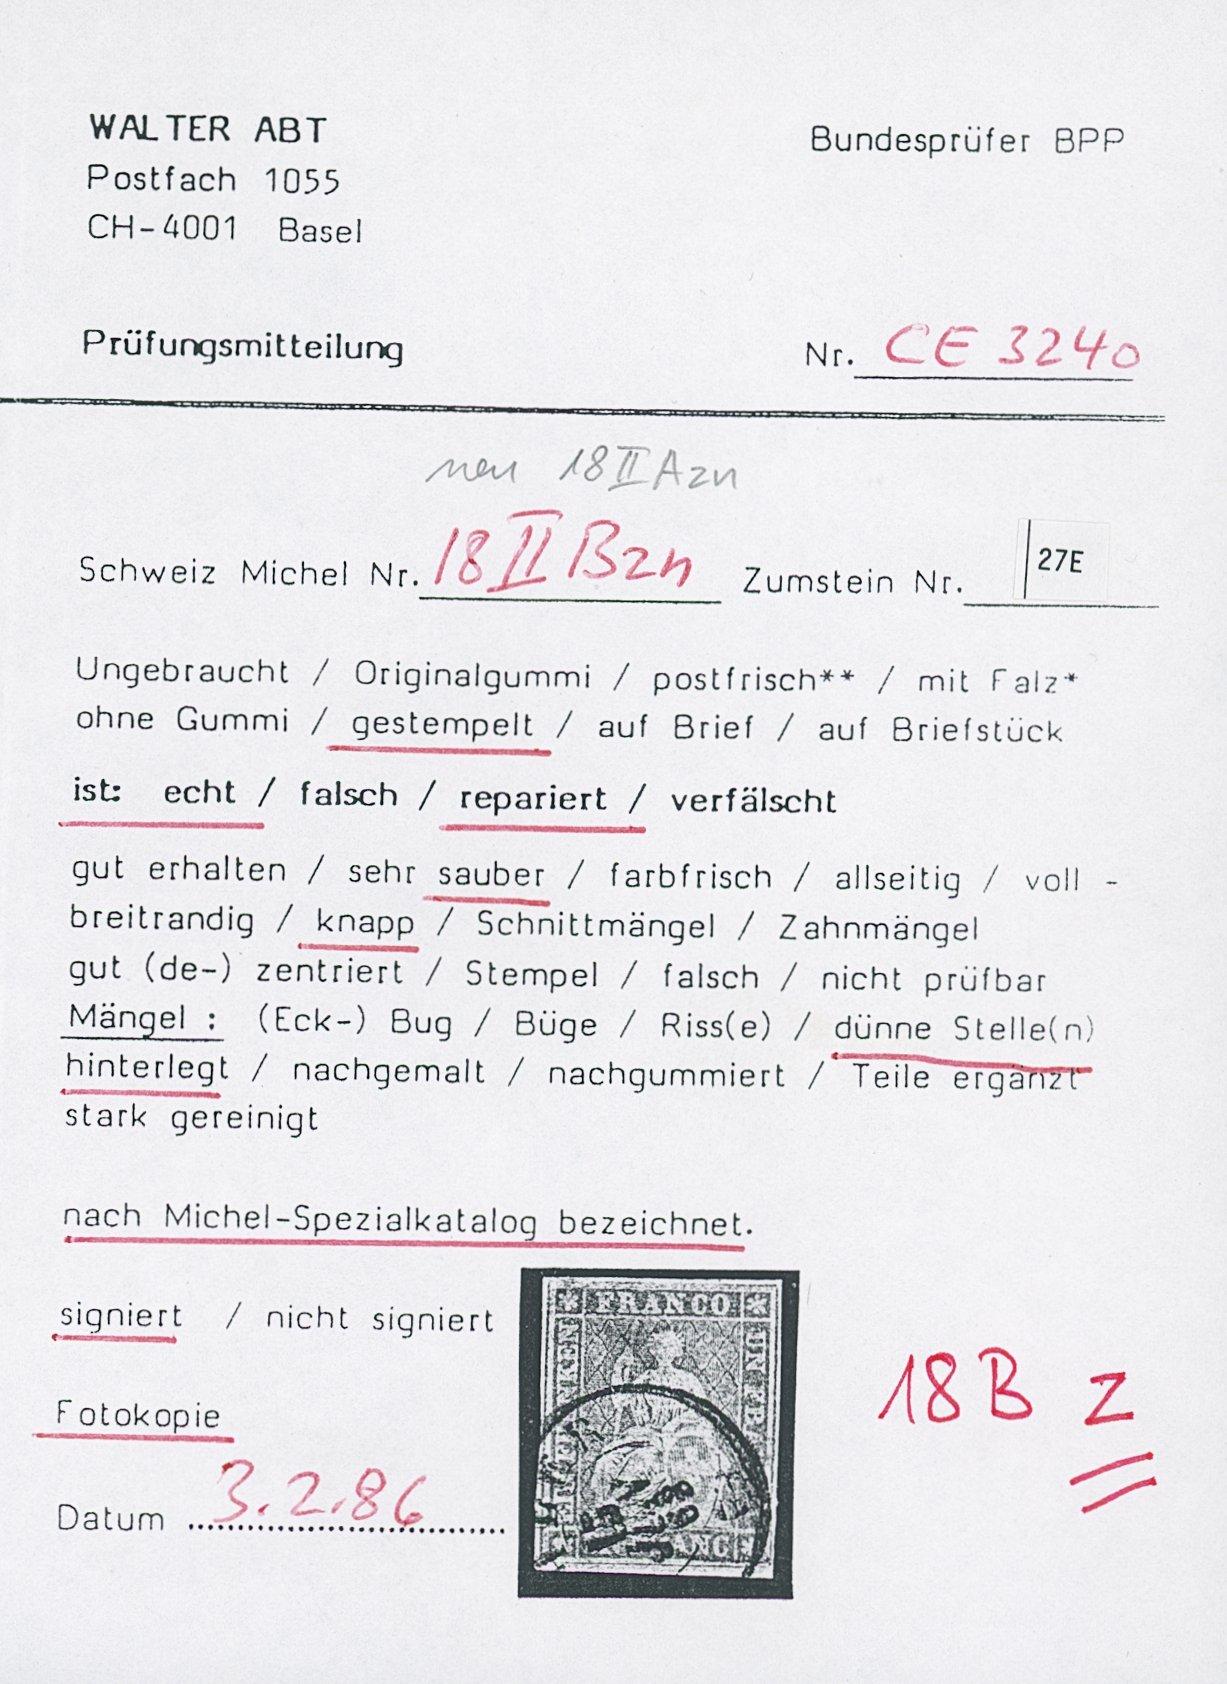 Lot 1106 - Switzerland swiss federal post -  Sellschopp Auktionen GmbH Auction #1